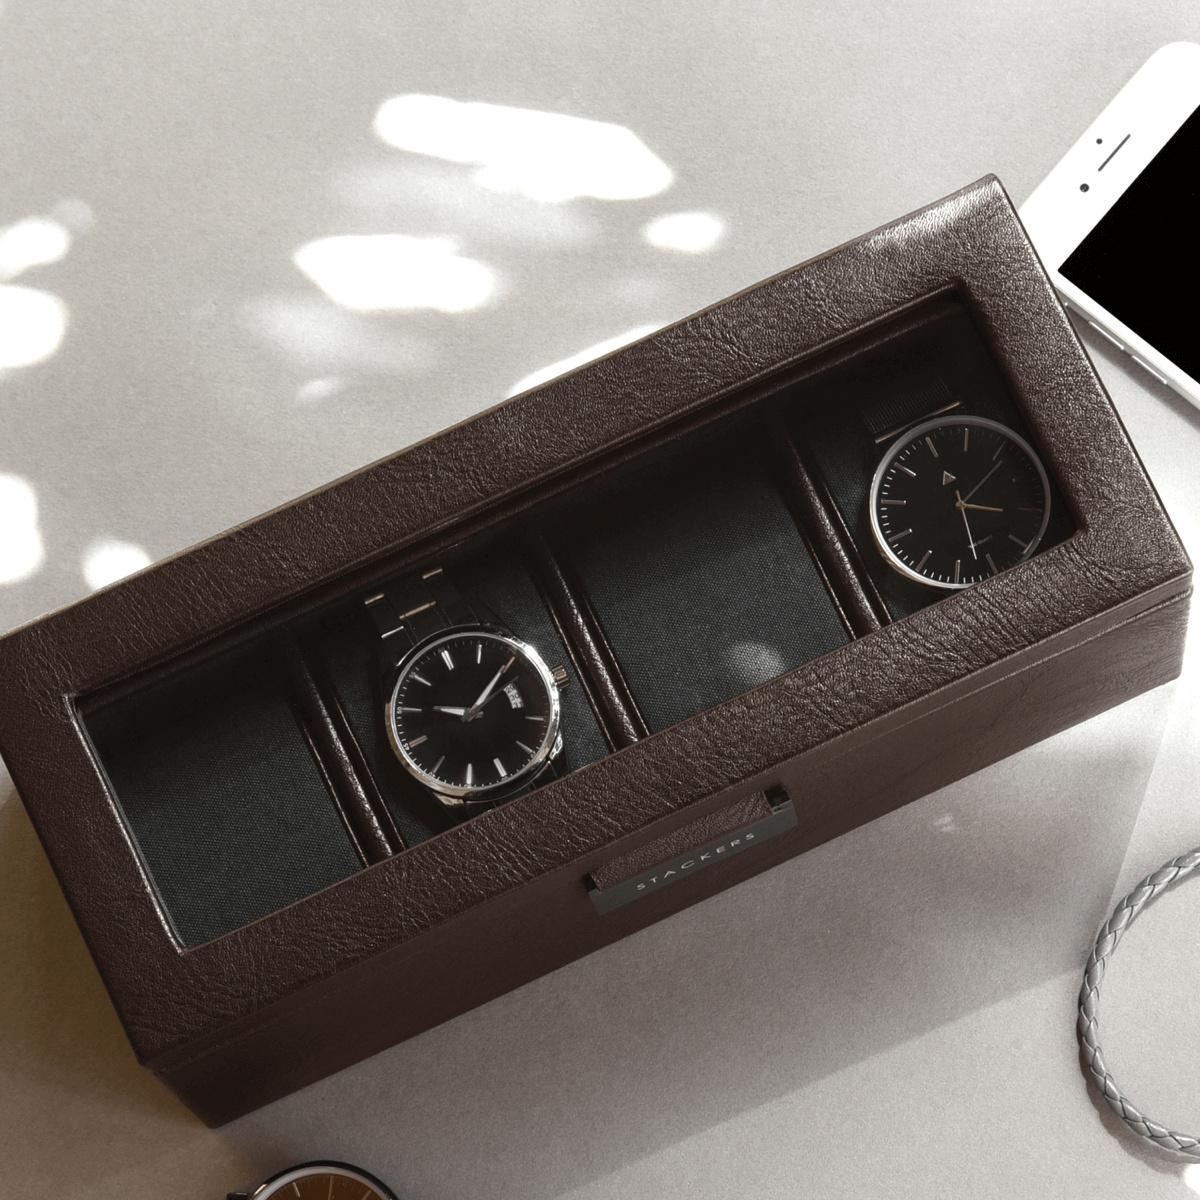 4-Watch Box Brown-1